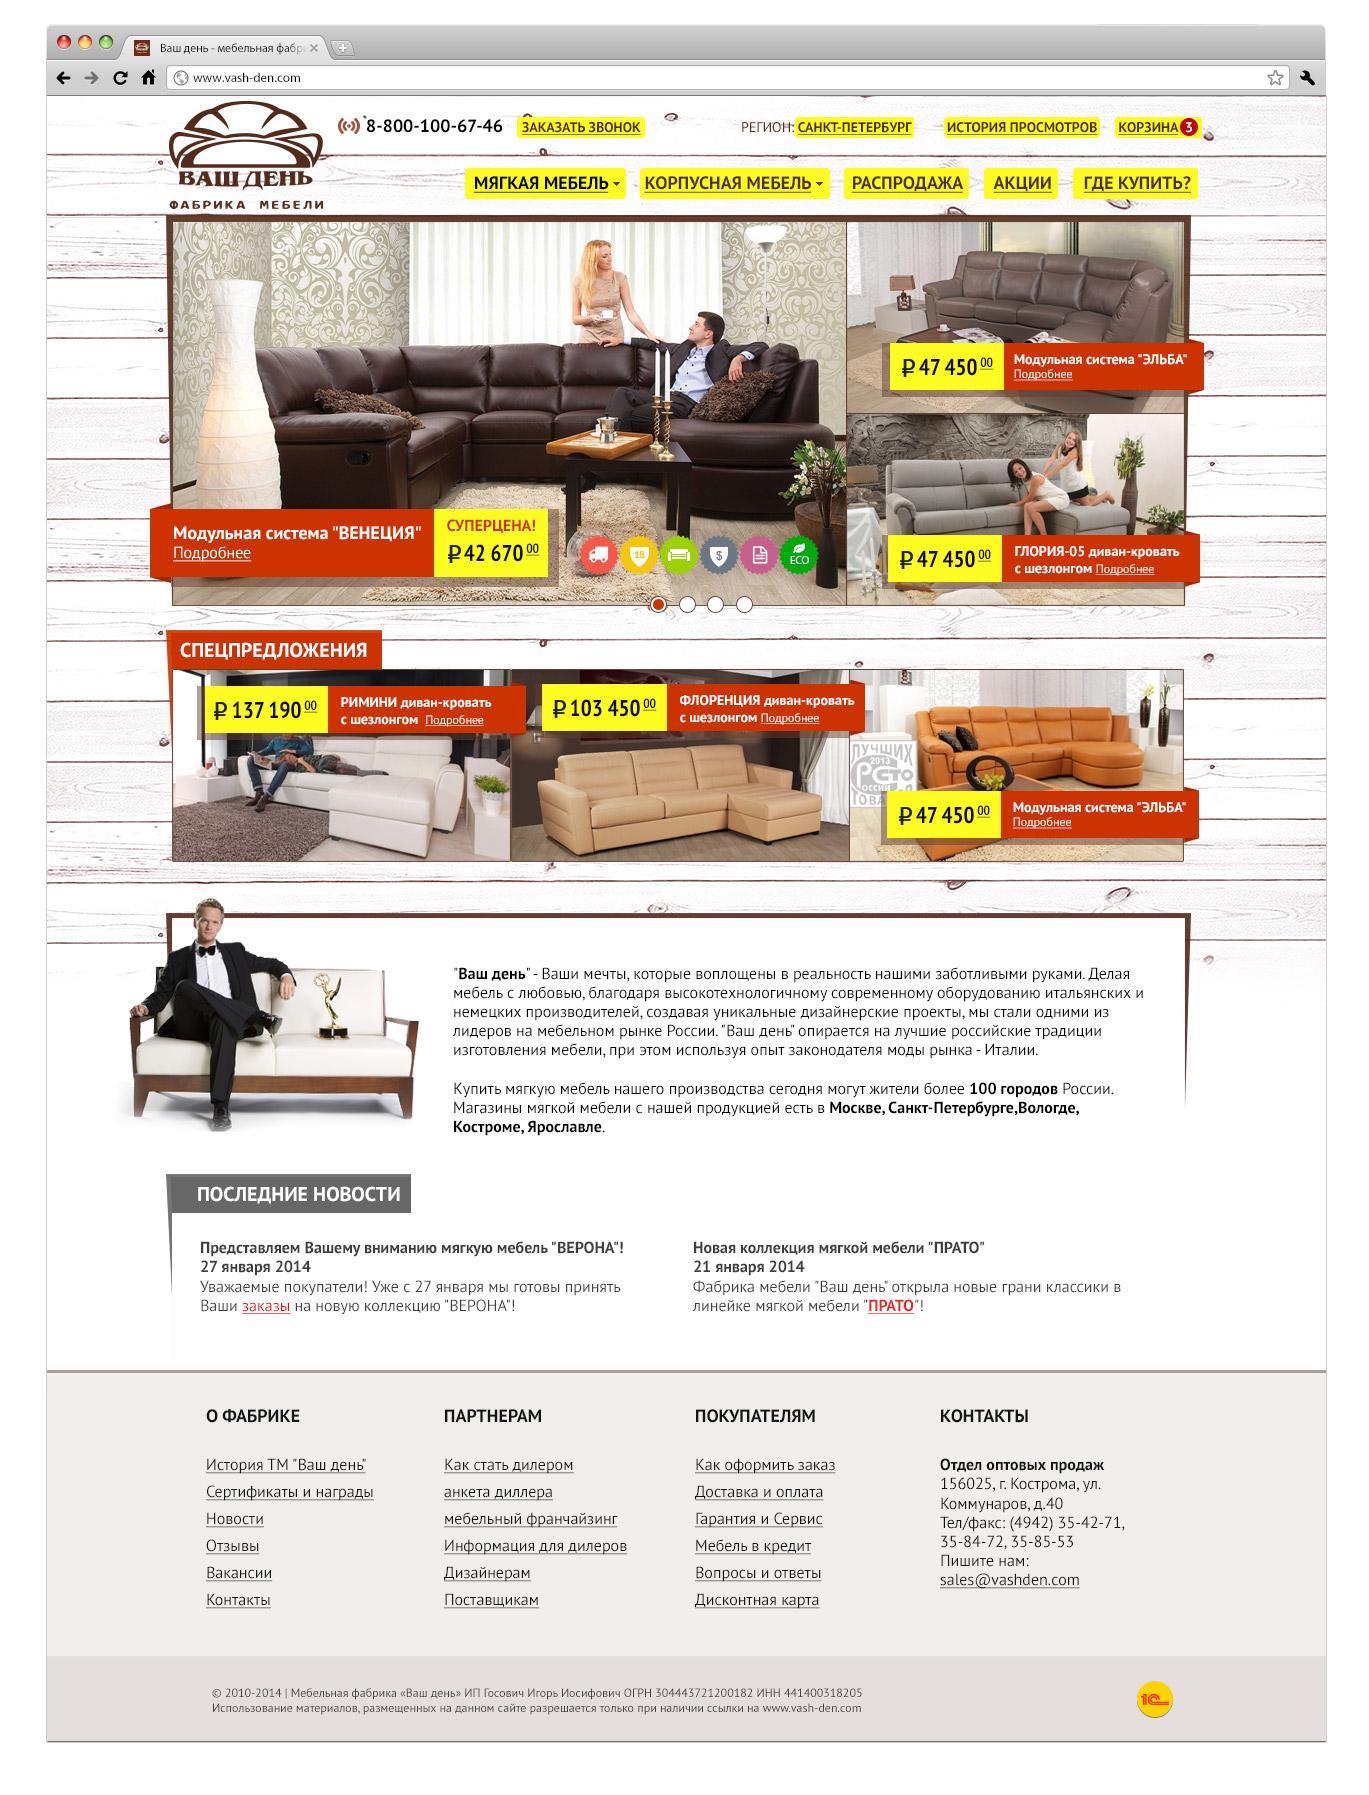 Разработать дизайн для интернет-магазина мебели фото f_28452ea28b2737b0.jpg